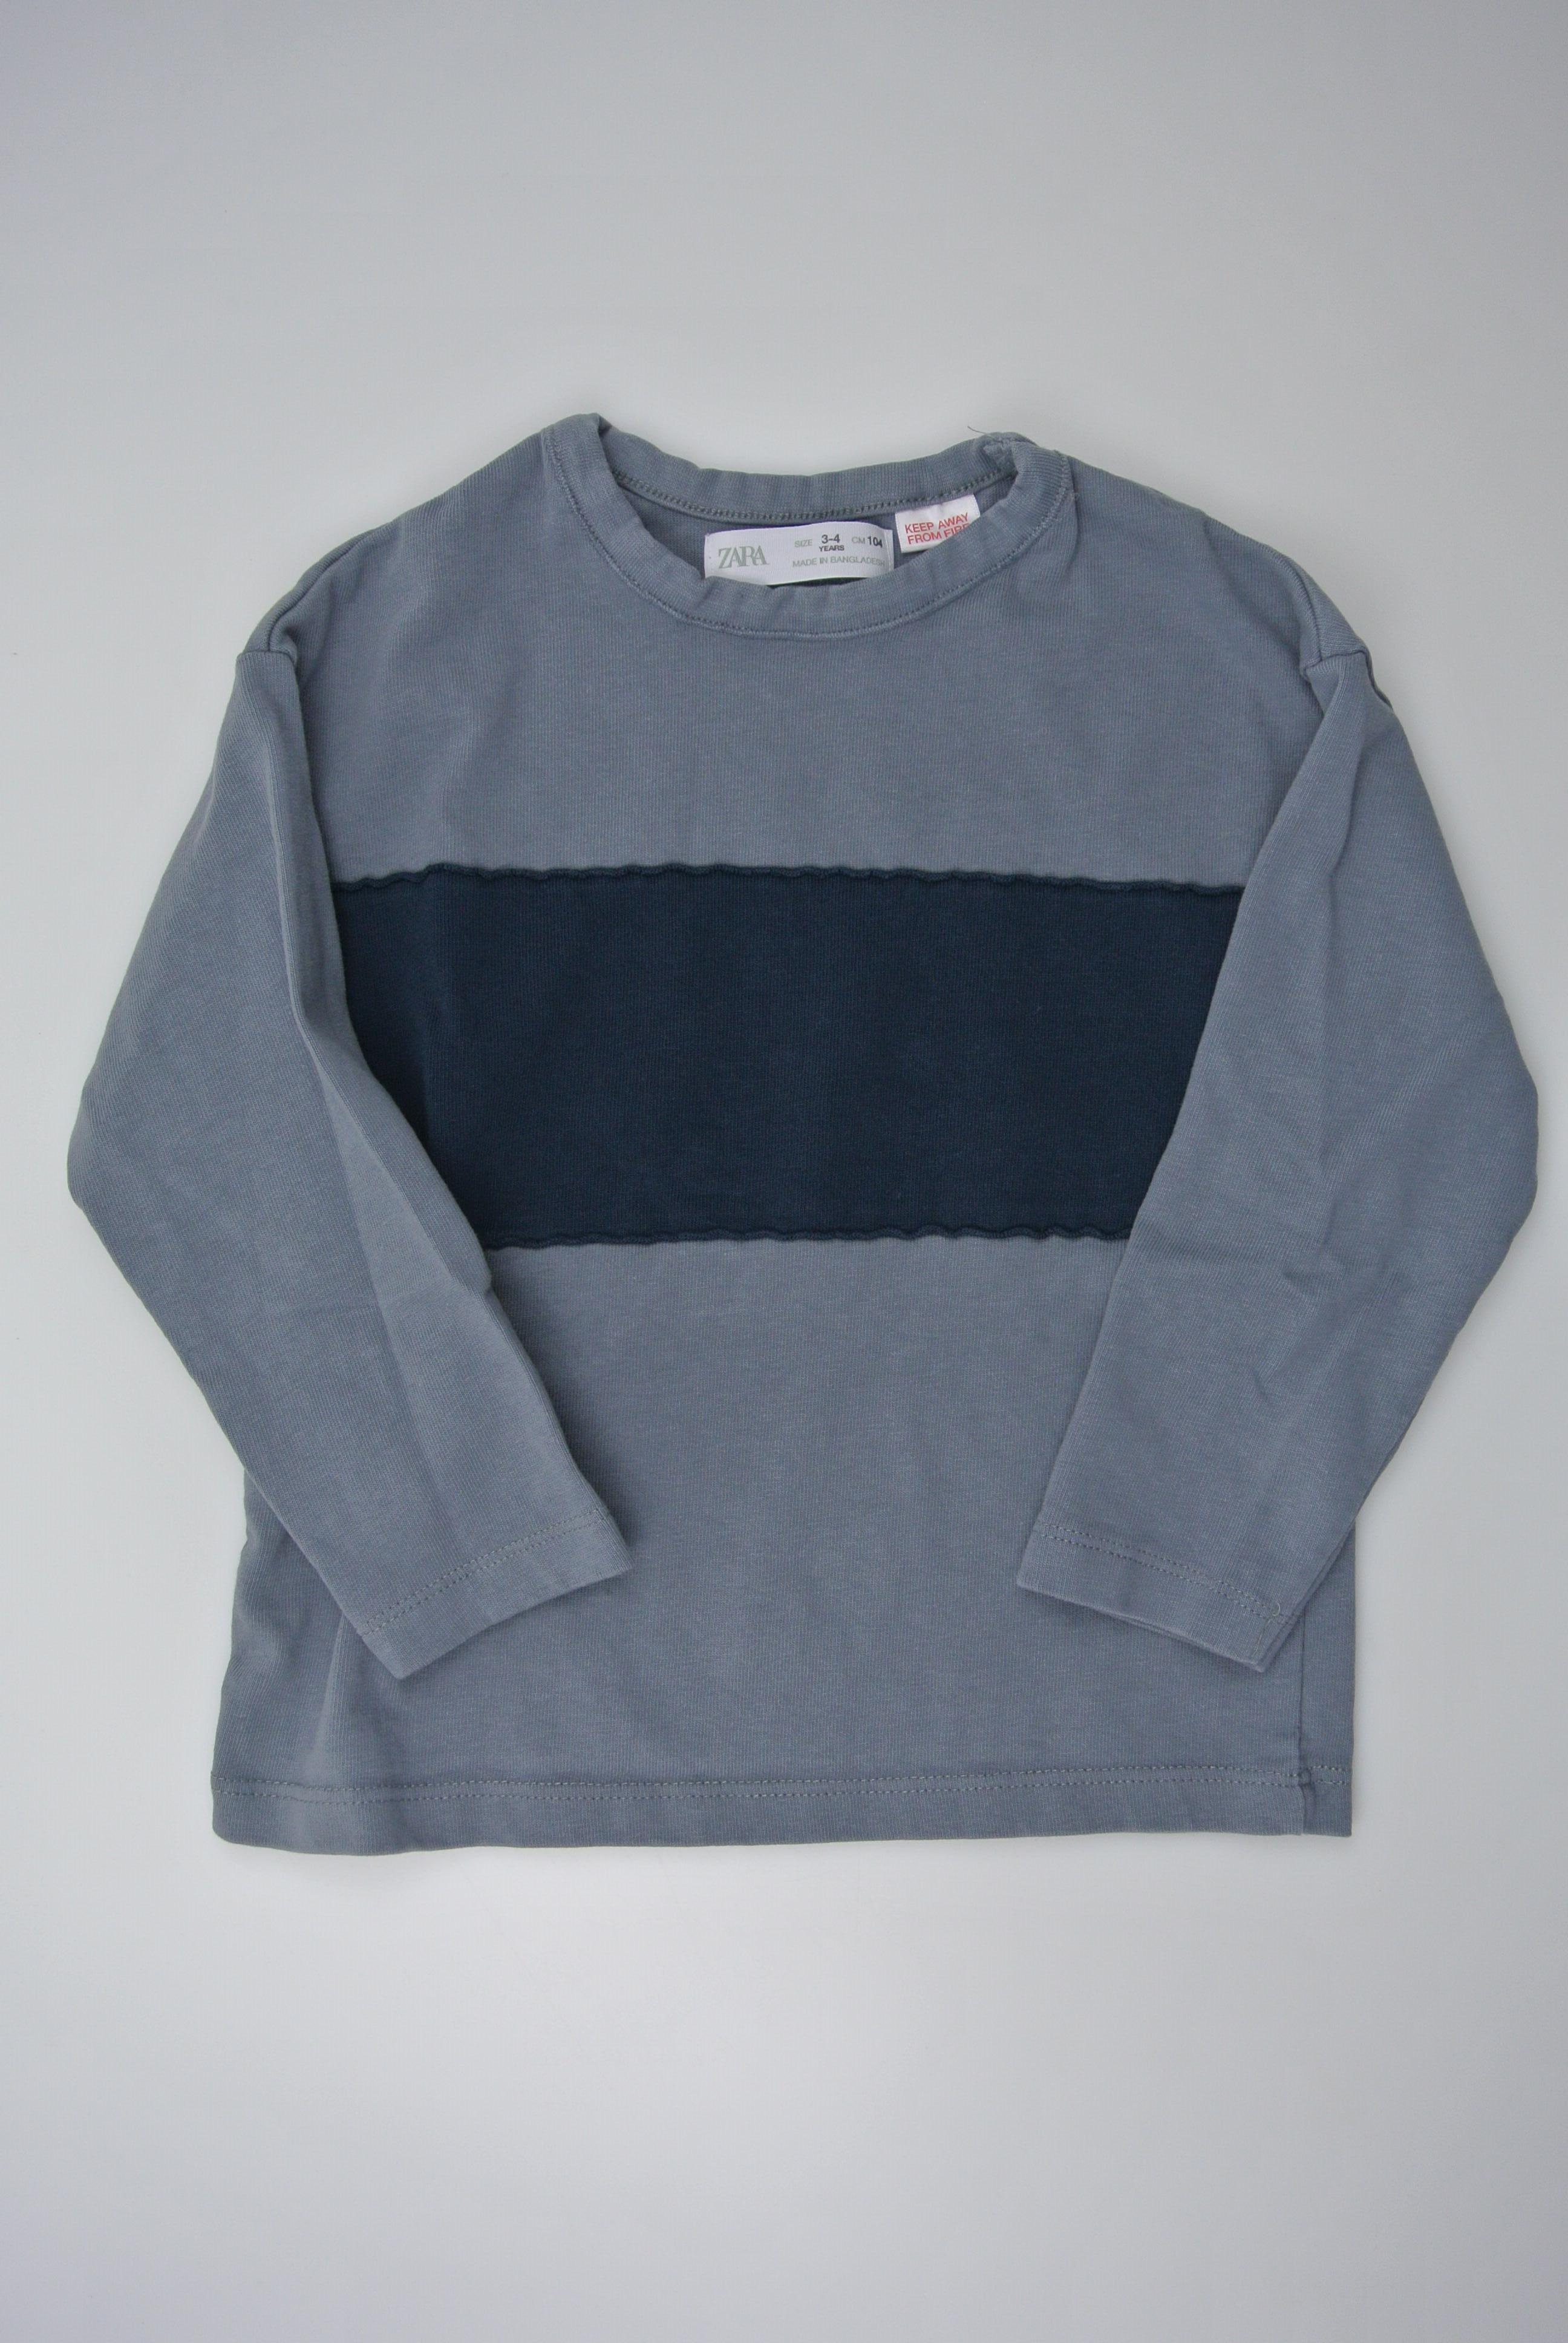 Zara trøje str 98/104 dreng